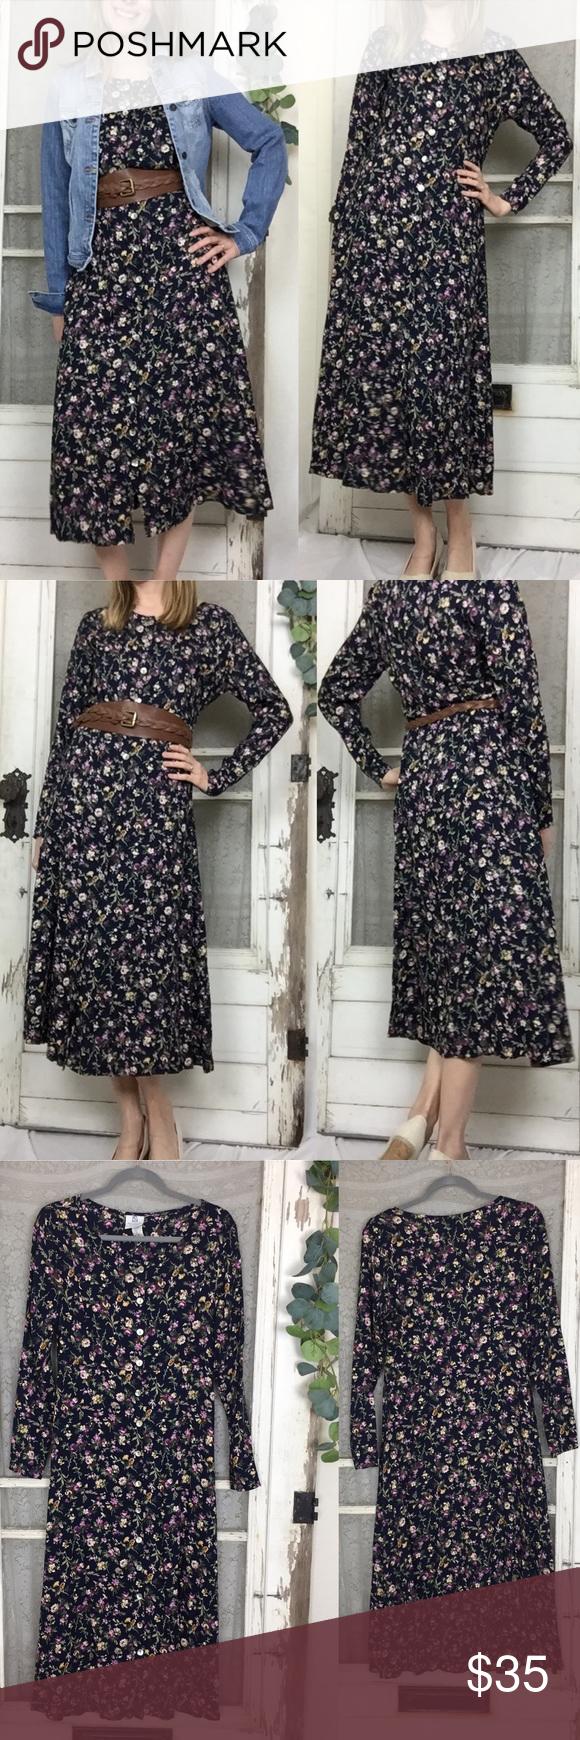 Motherwear Nursing Vintage Floral Midi Dress S Floral Midi Dress Black Long Sleeve Dress Midi Dress